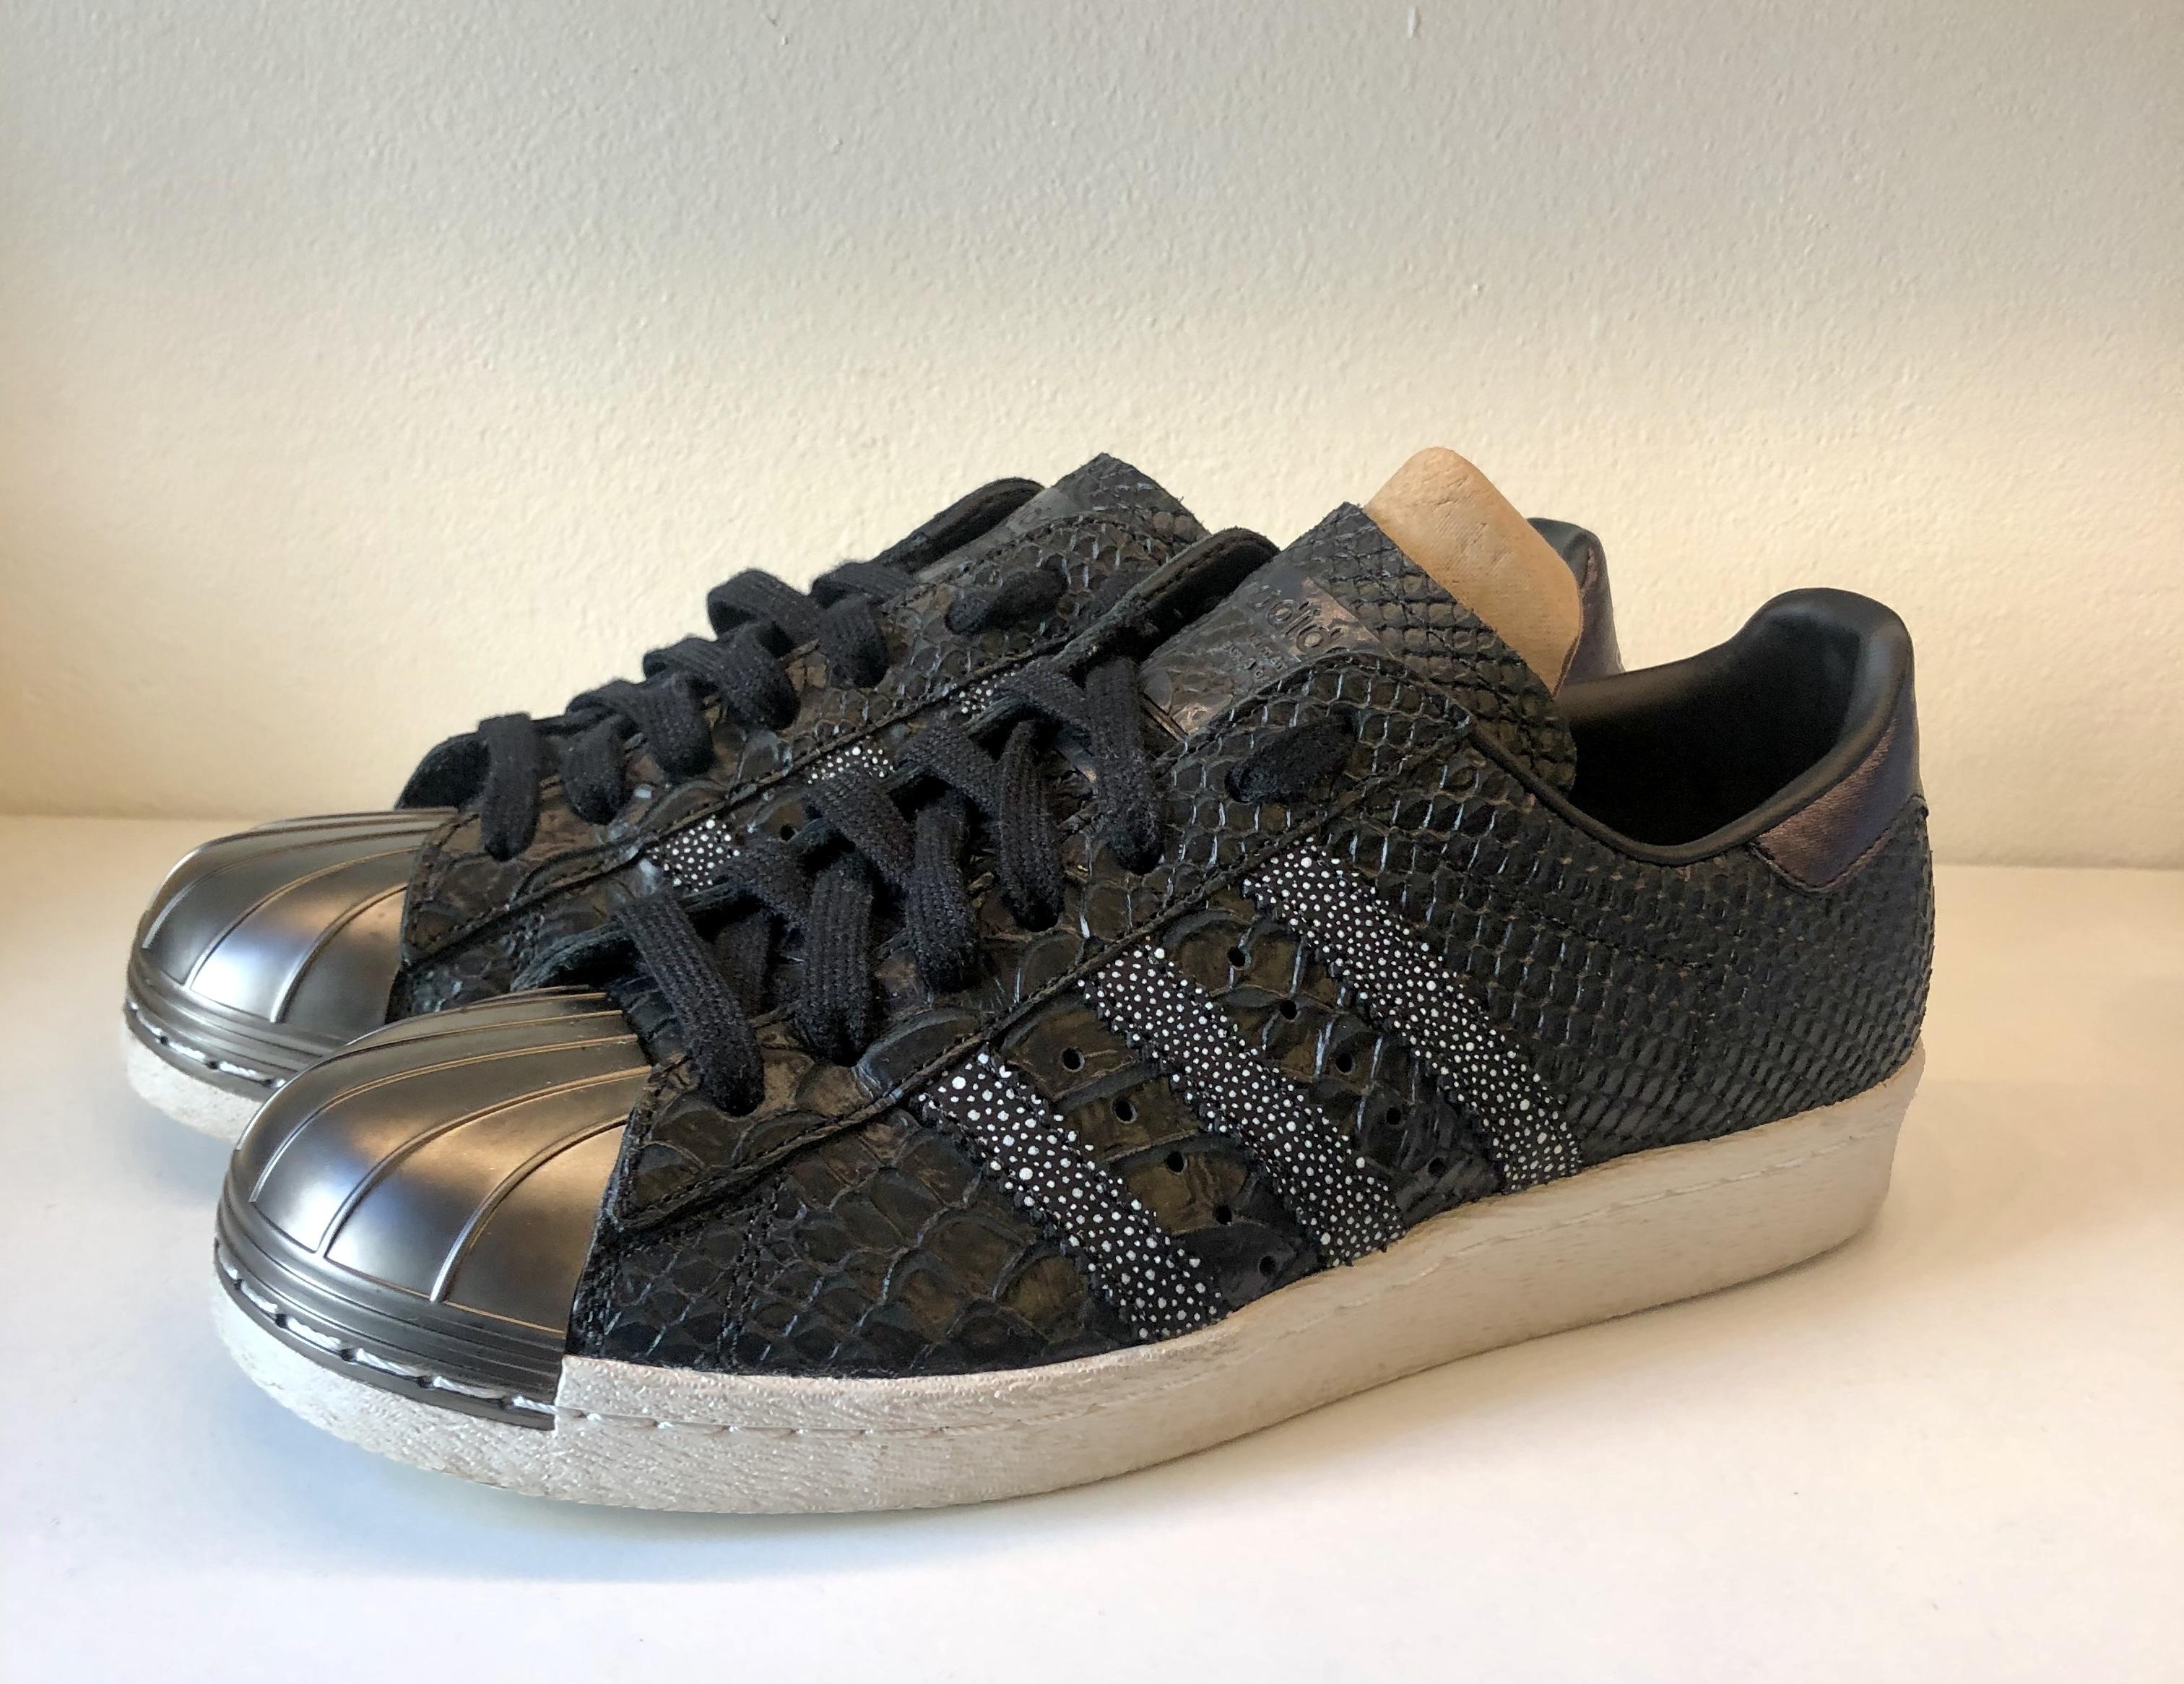 Adidas Superstar MI